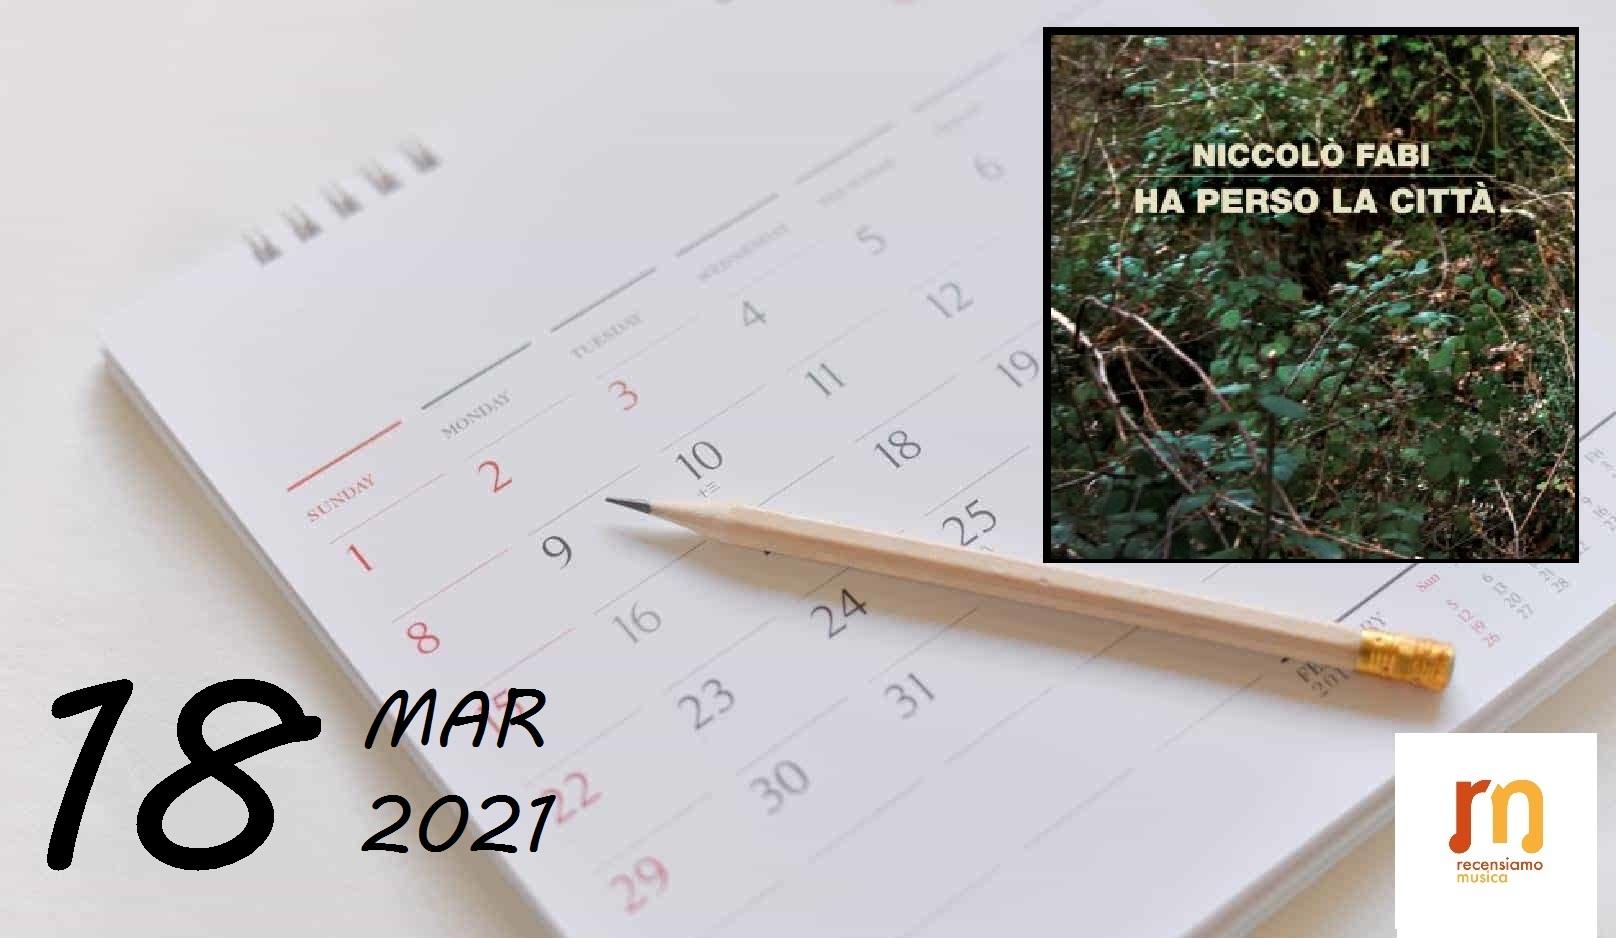 18 marzo